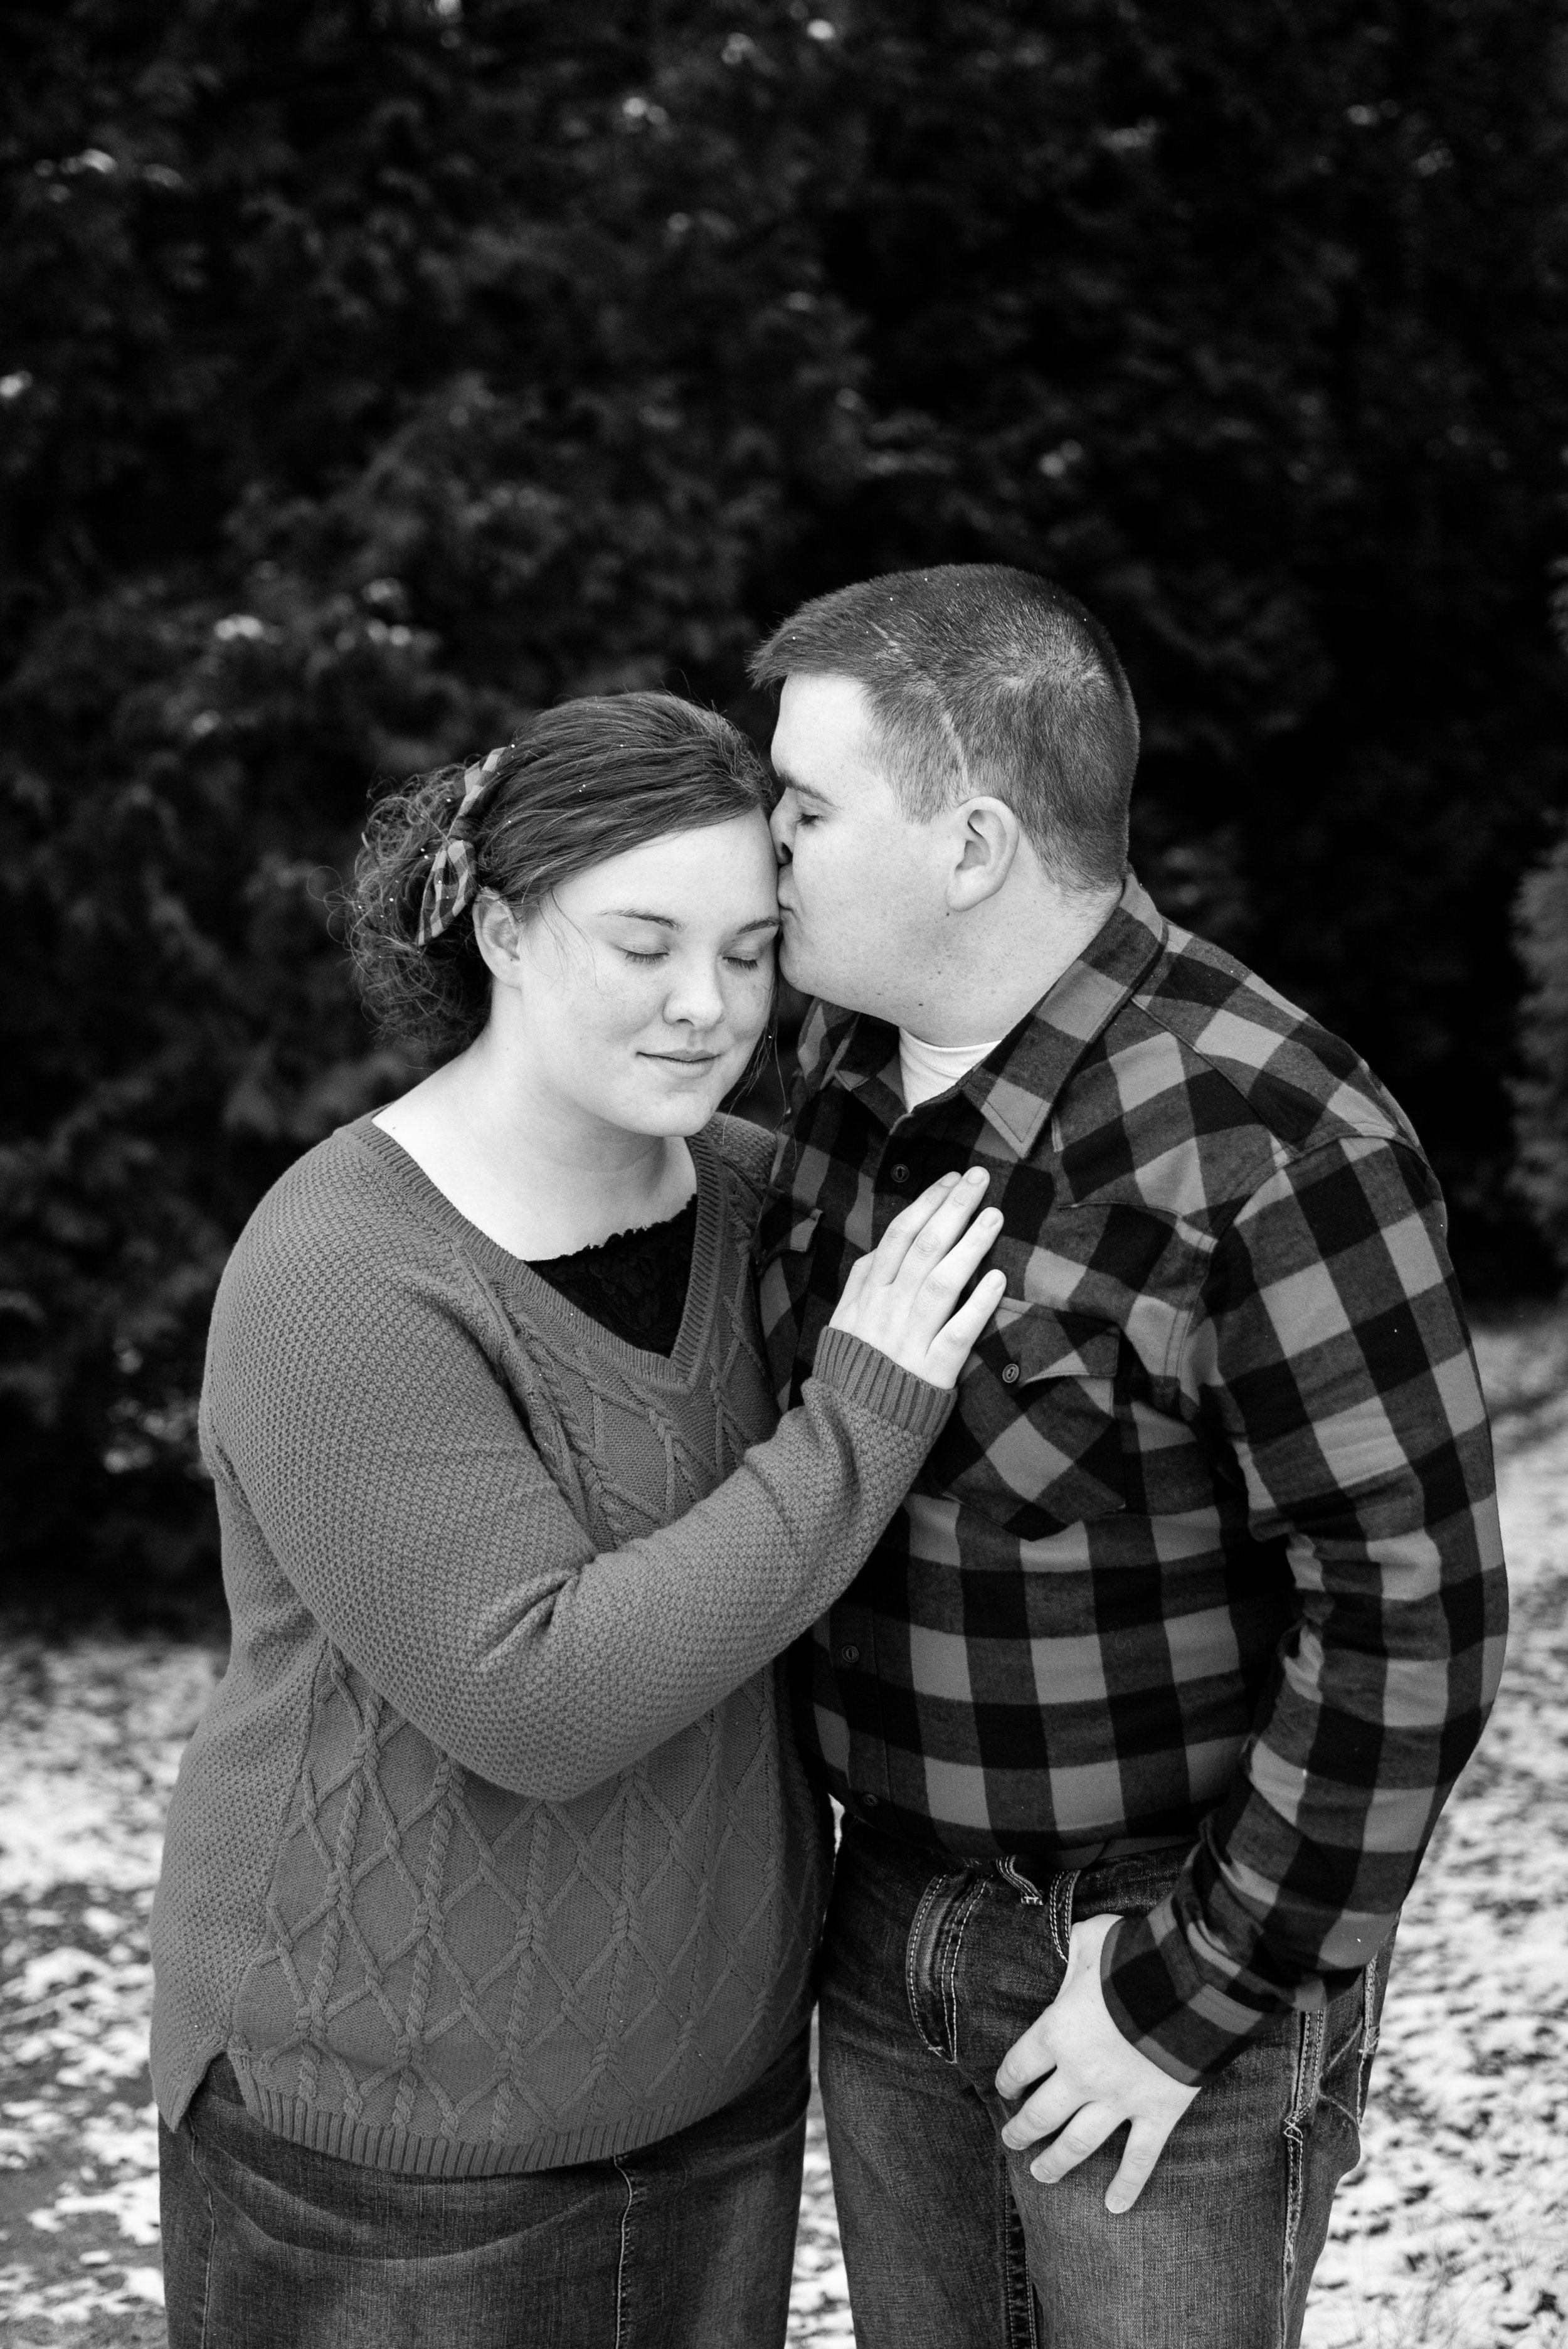 Kyla Jo Photography // Muncie, Indiana // Couple Photographer // Whitetail Tree Farm // Christmas Photos // Midwest Photographer // Indianapolis Photographer // Black and White Romantic Photos